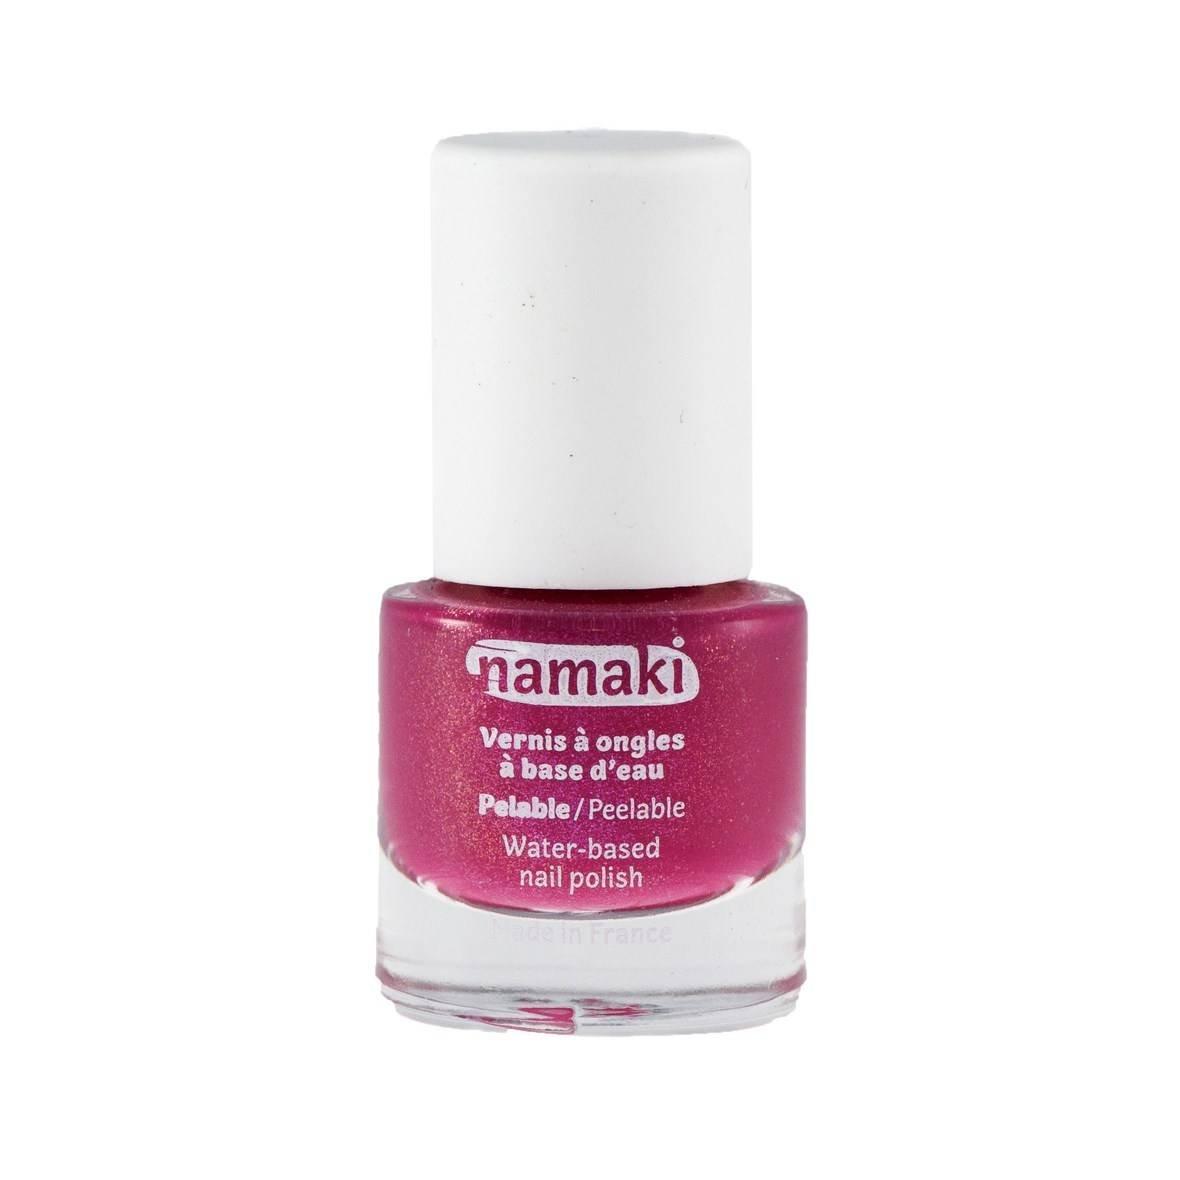 NAMAKI - Water Based Nail Polish - Fuchsia - Easy to apply - Dries quickly - No harmful chemical additives - 7.5 ml